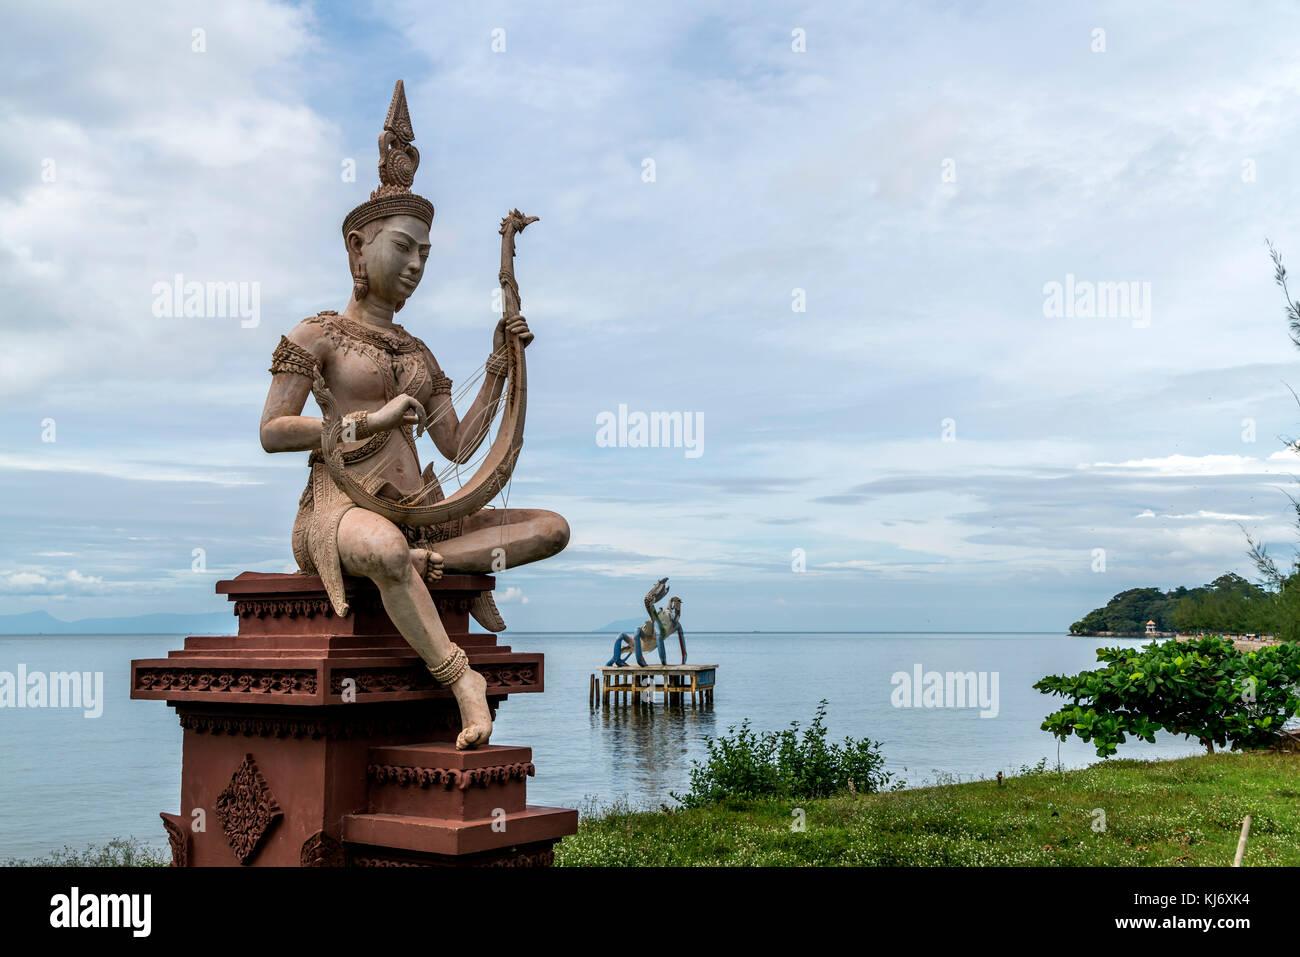 buddhistische Statue an der Küste bei Kep, Kambodscha, Asien      buddhist statue at the coast in Kep, Cambodia, - Stock Image